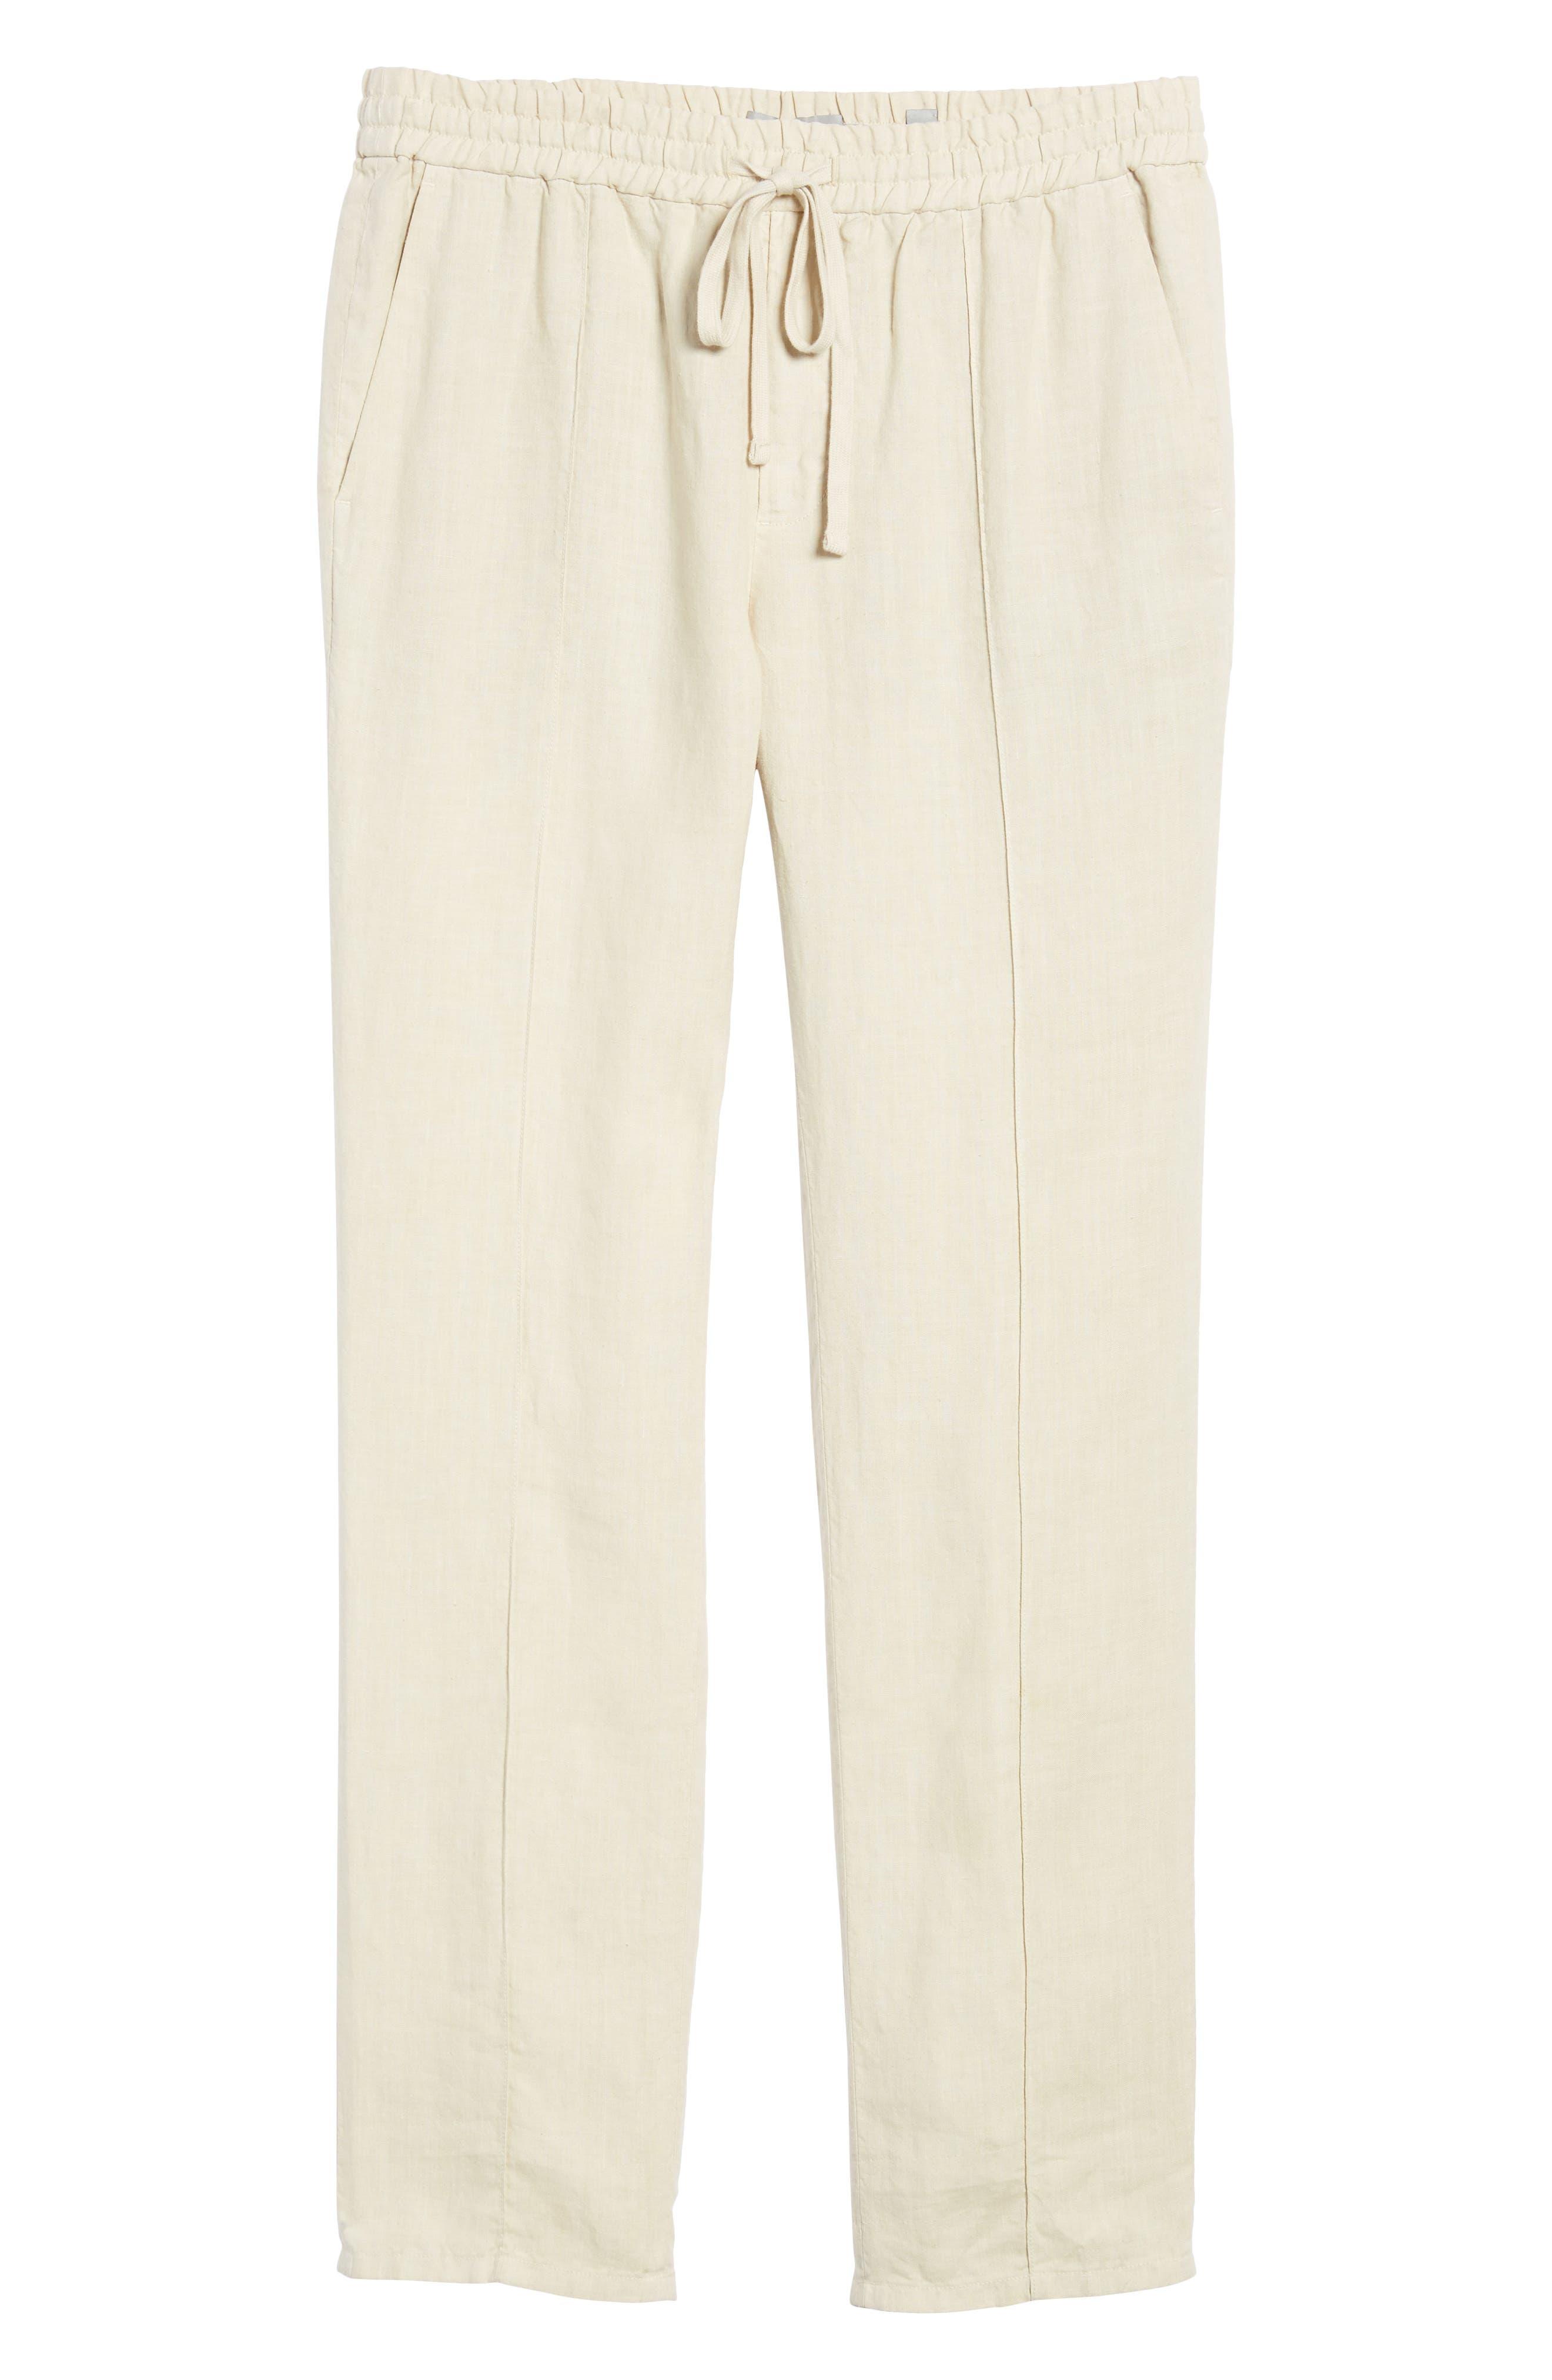 Pintuck Slim Fit Hemp Track Pants,                             Alternate thumbnail 6, color,                             250